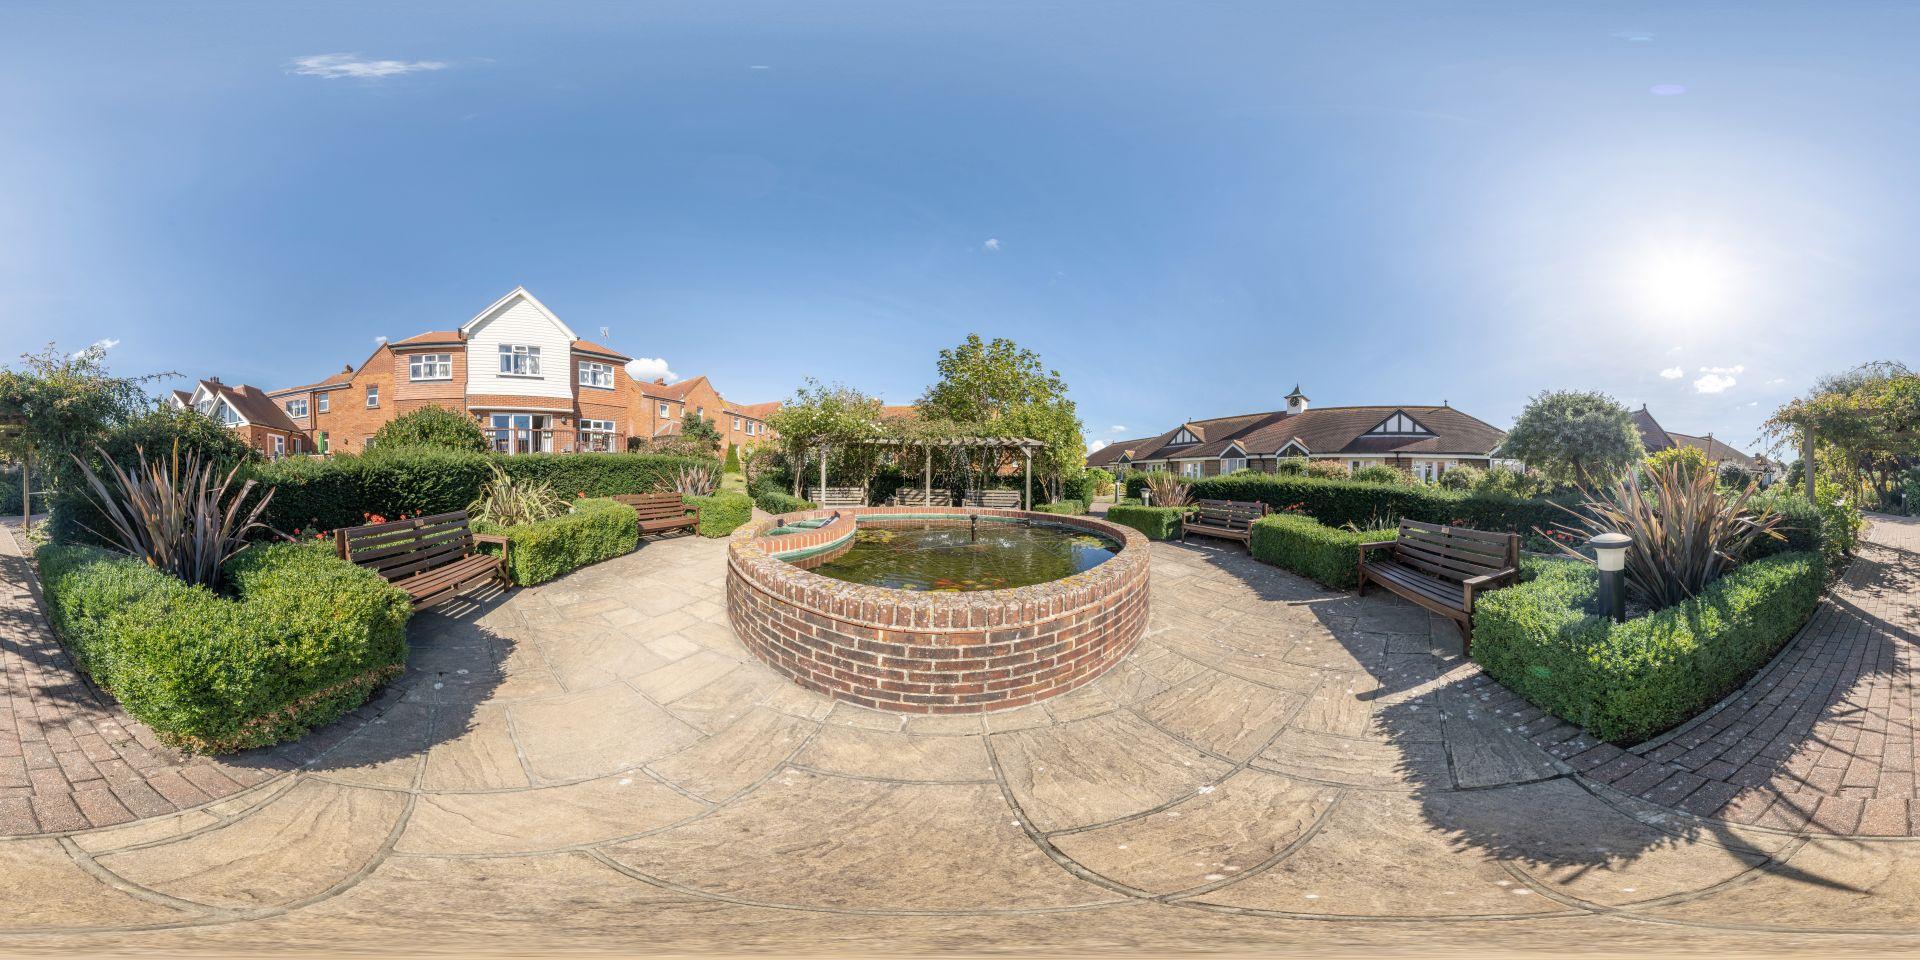 Queen Alexandra Cottage Homes – Eastbourne